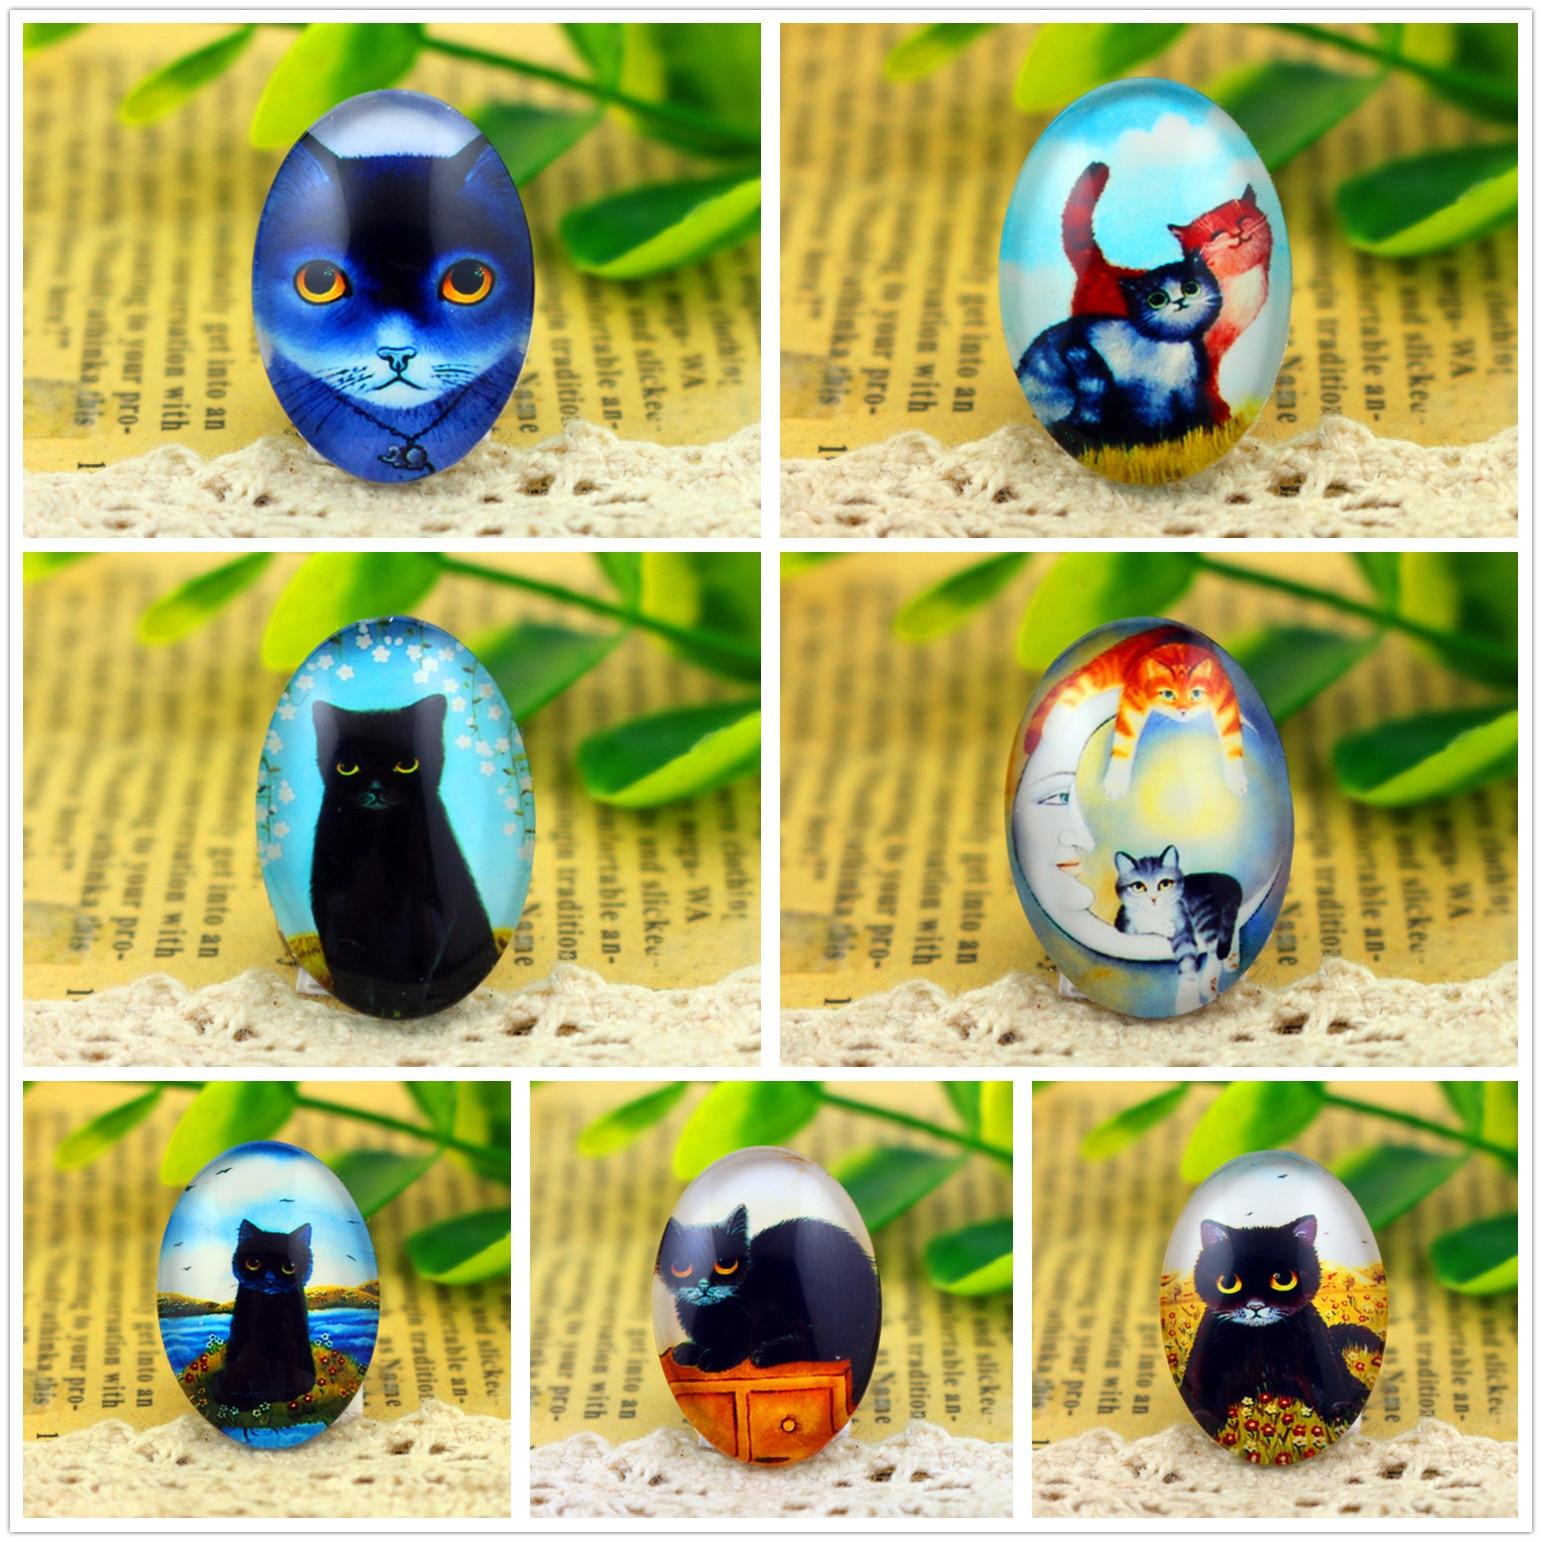 Hot Sale 10pcs 18x25mm Handmade Photo Glass Cabochons  (Cat Series)